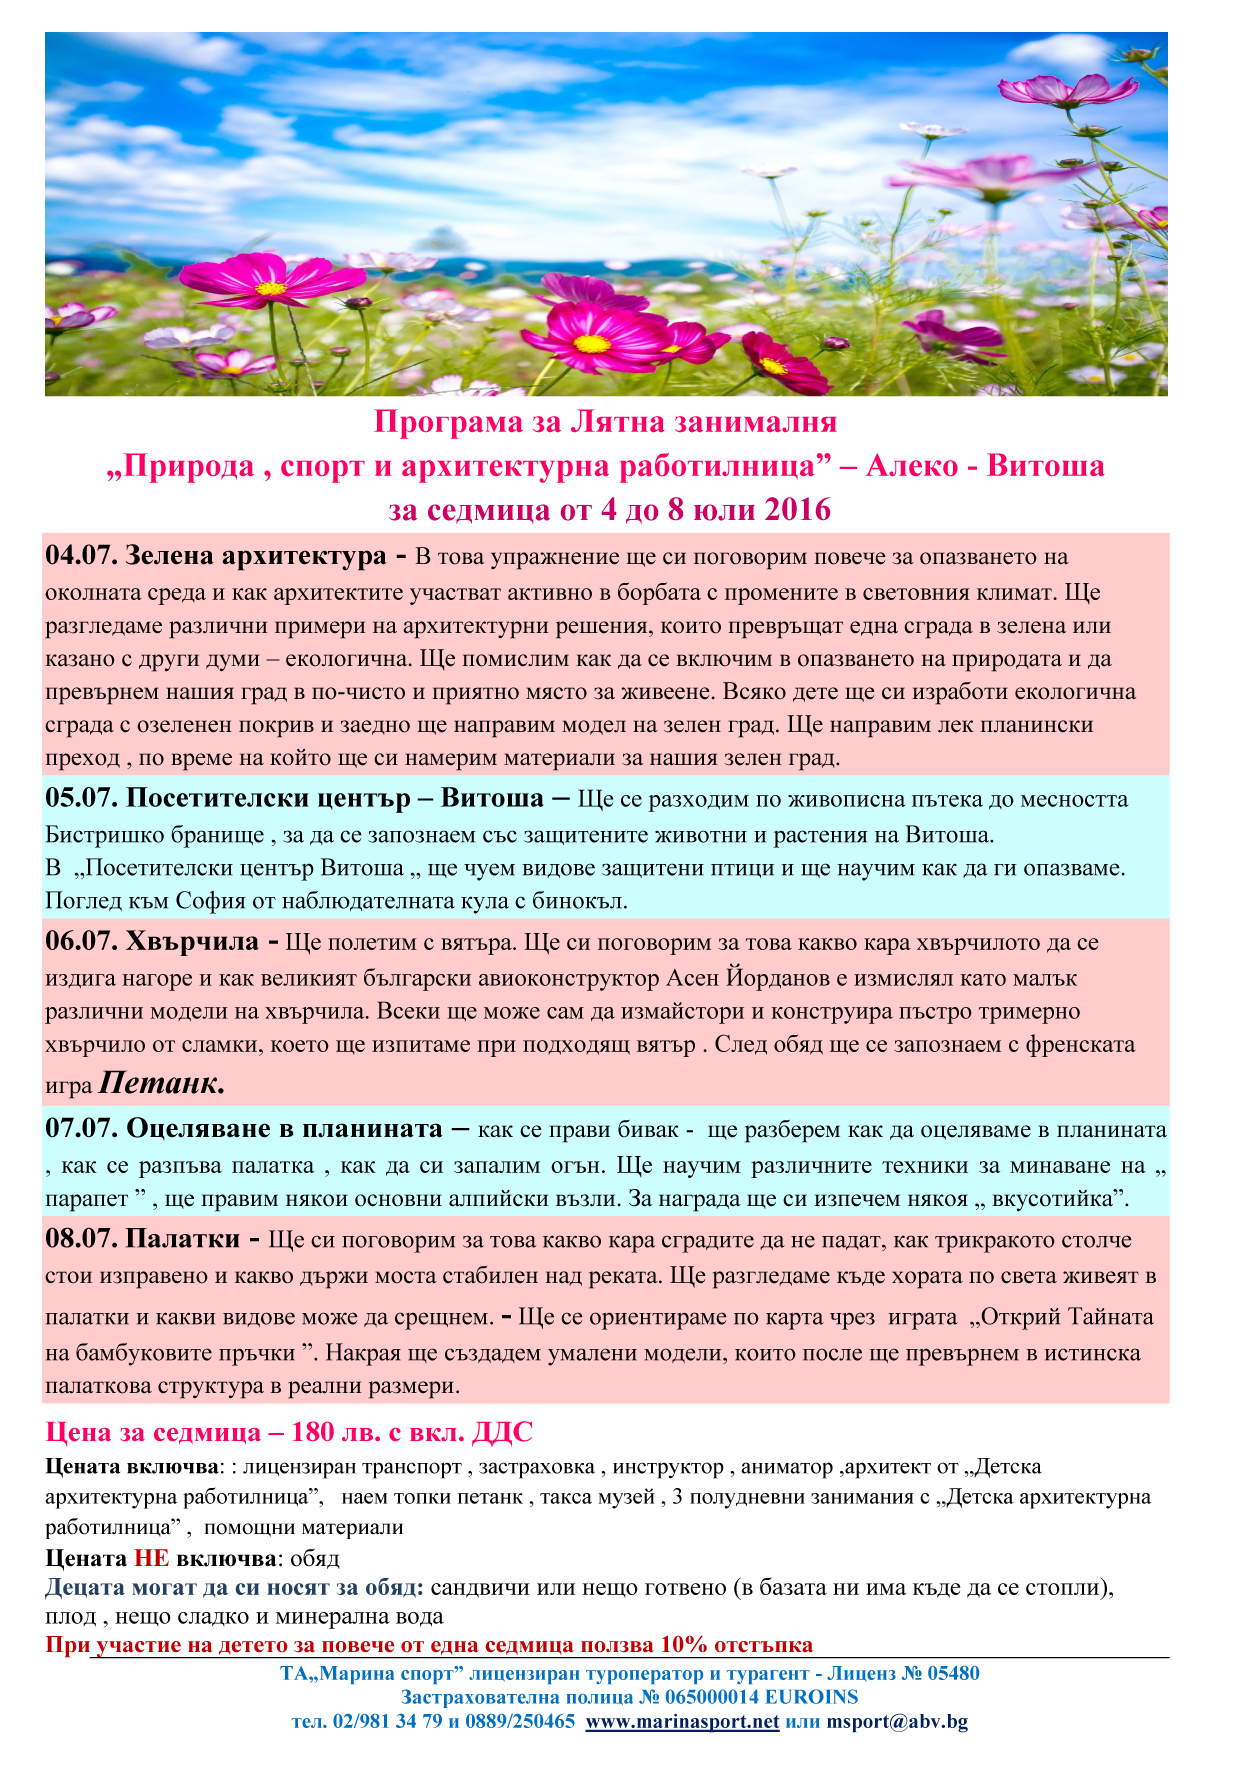 """Природа , спорт и архитектурна работилница"", Алеко, Витоша - 4 до 8 юли 2016г."